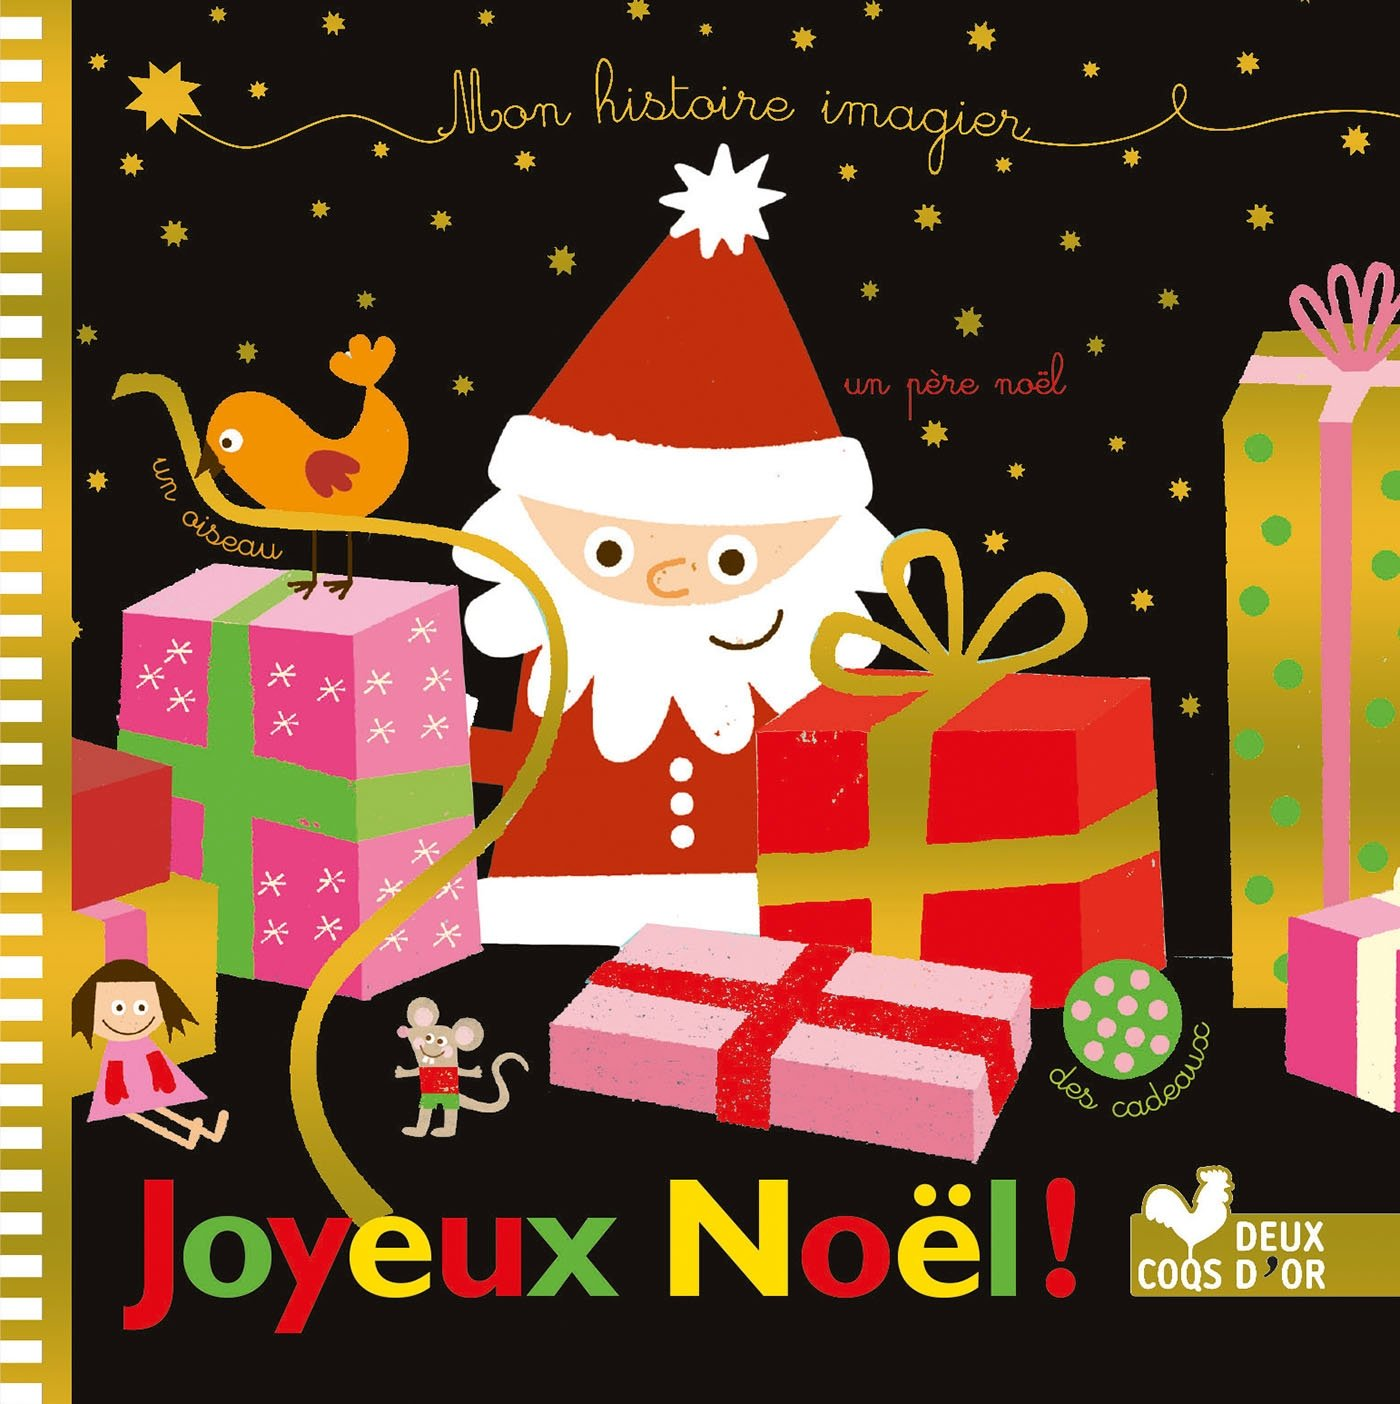 Joyeux Noel Mon Histoire Imagier Amazon Fr Virginie